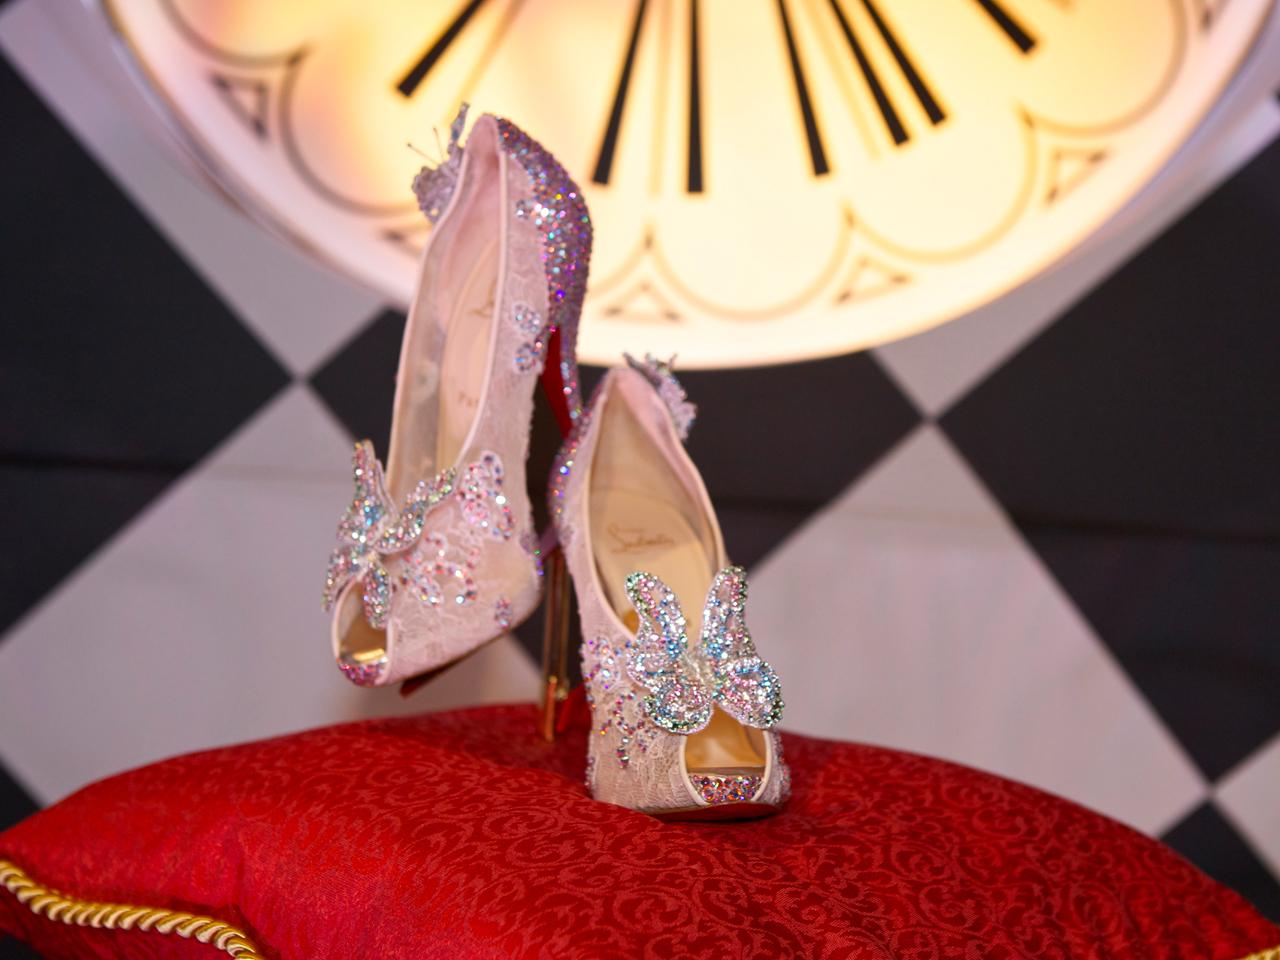 7bb75382c86 Christian Louboutin unveils Cinderella-inspired slipper - CBS News